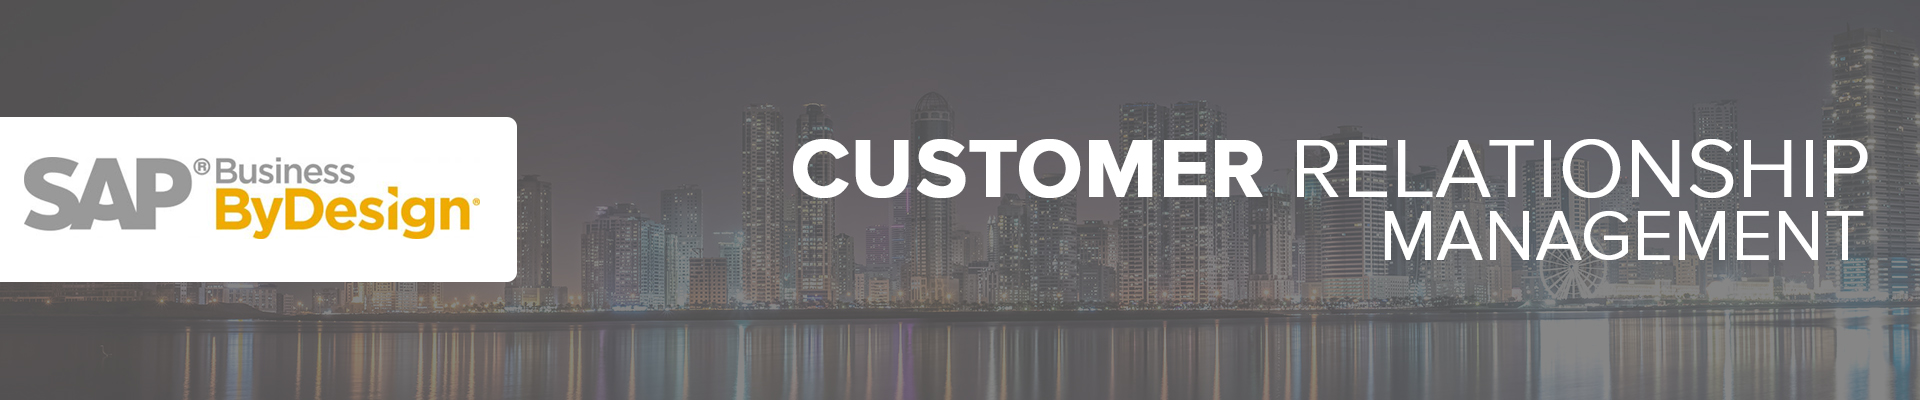 sap customer relationahip management